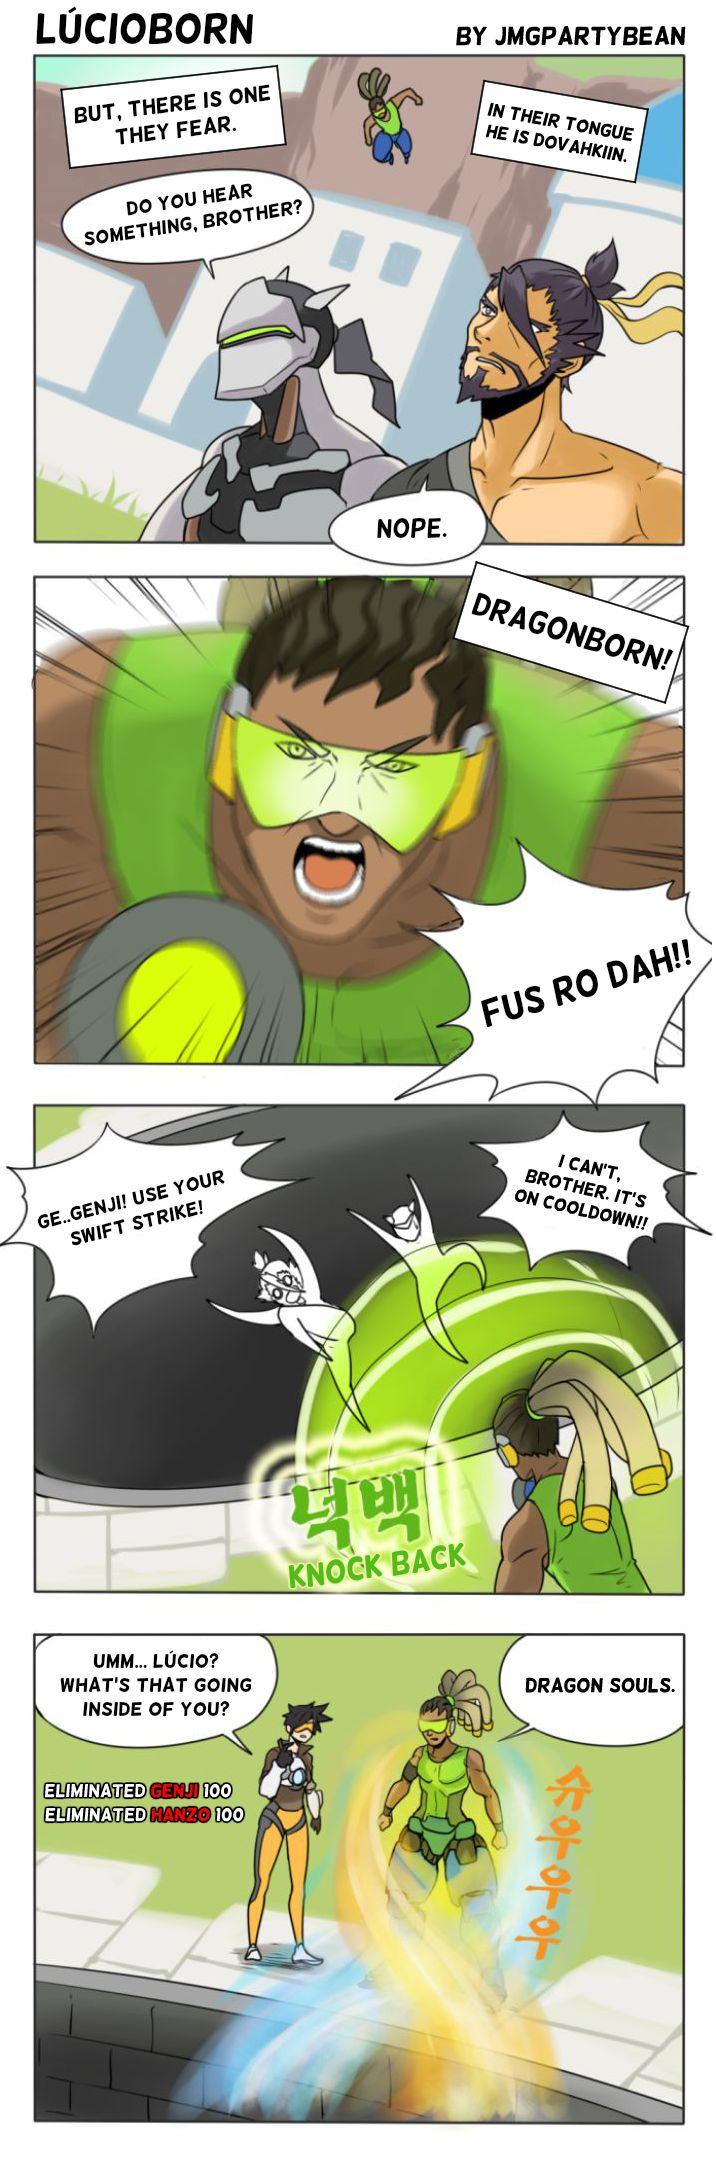 Lúcioborn | Overwatch | Know Your Meme